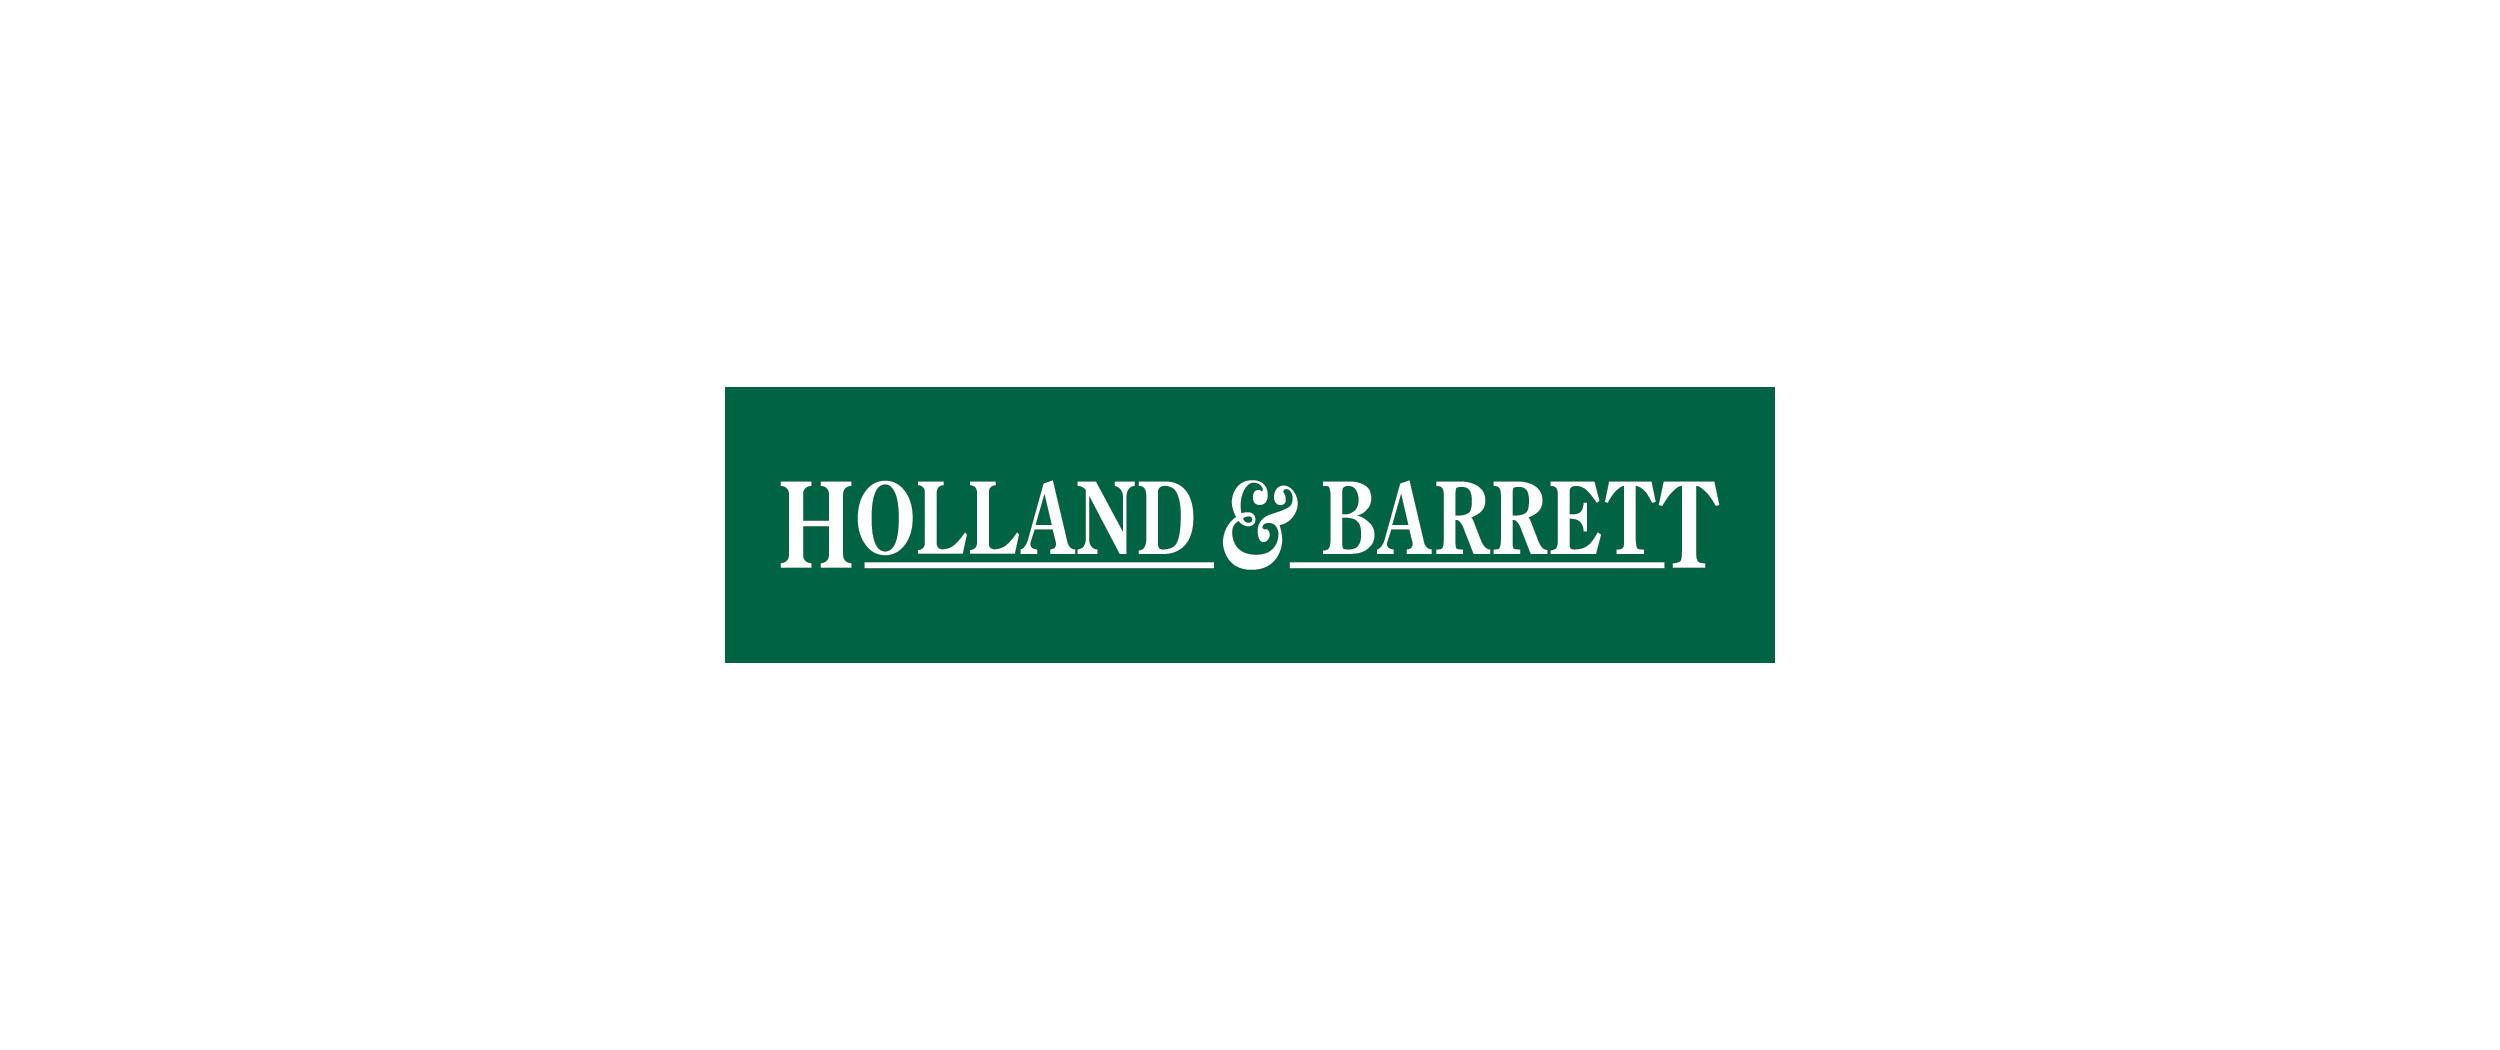 H&B_Logo_Only copy.jpg